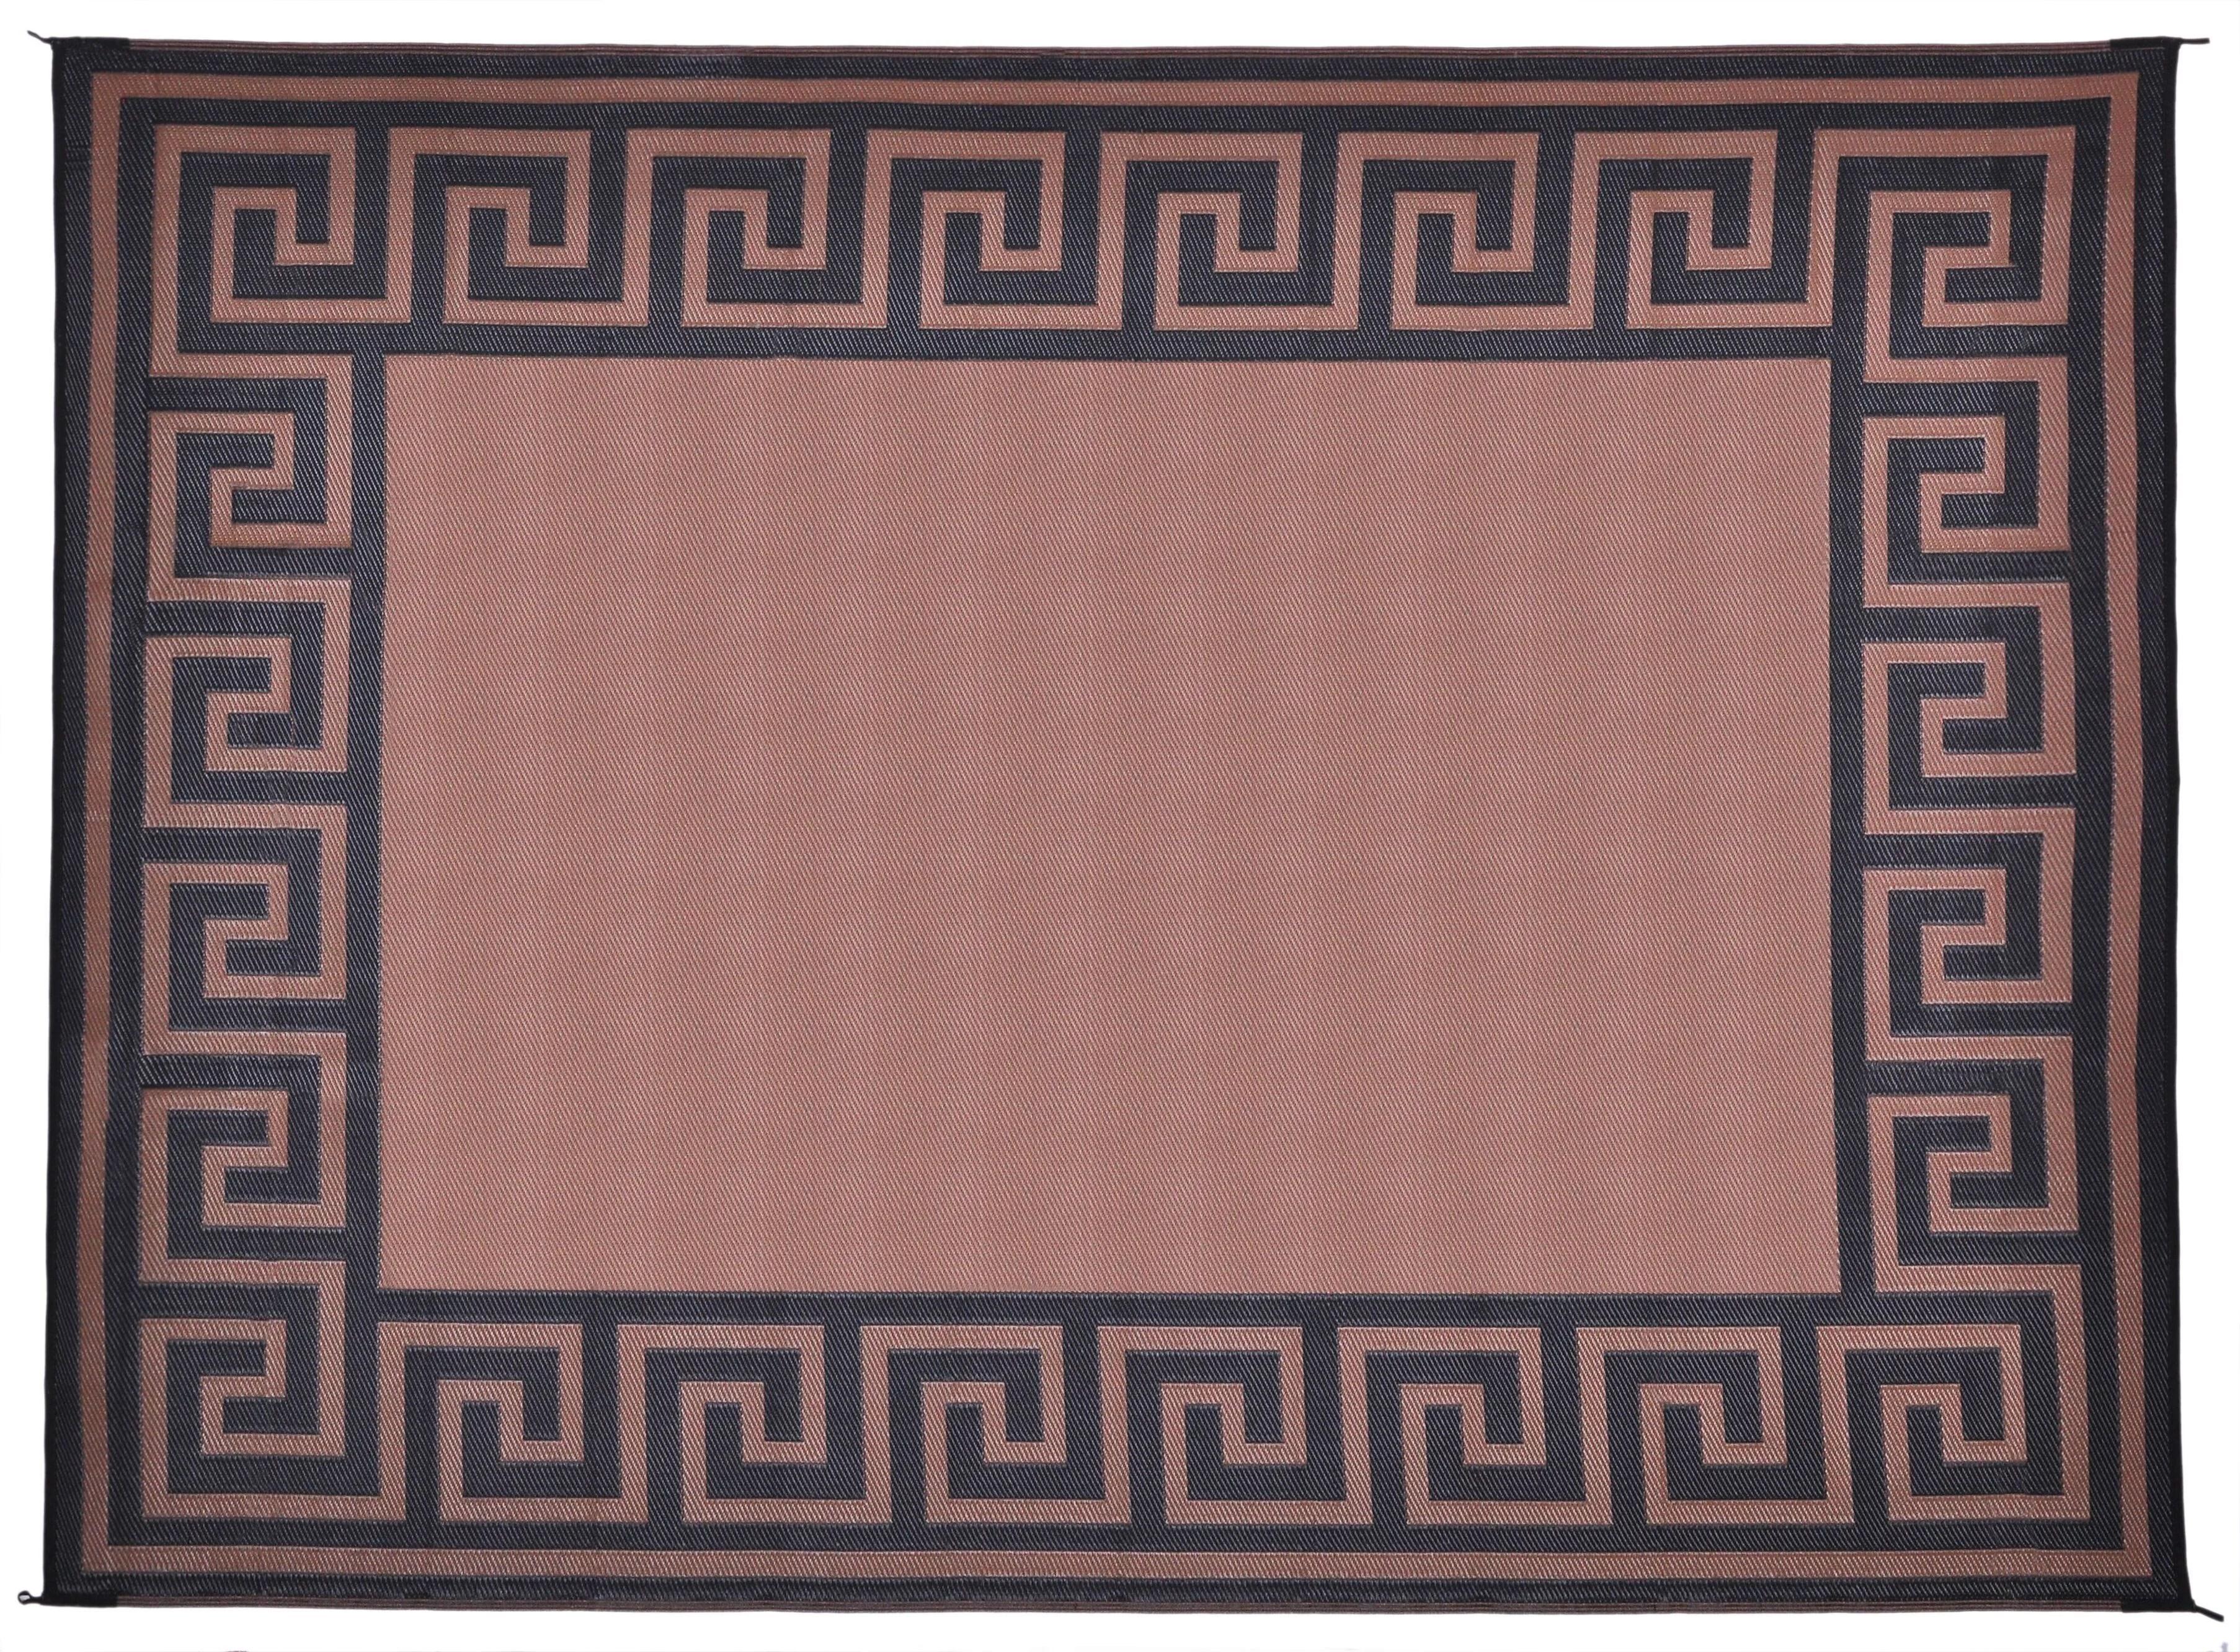 patio mats 9x12 reversible rv outdoor patio mat camping mat greek key tan